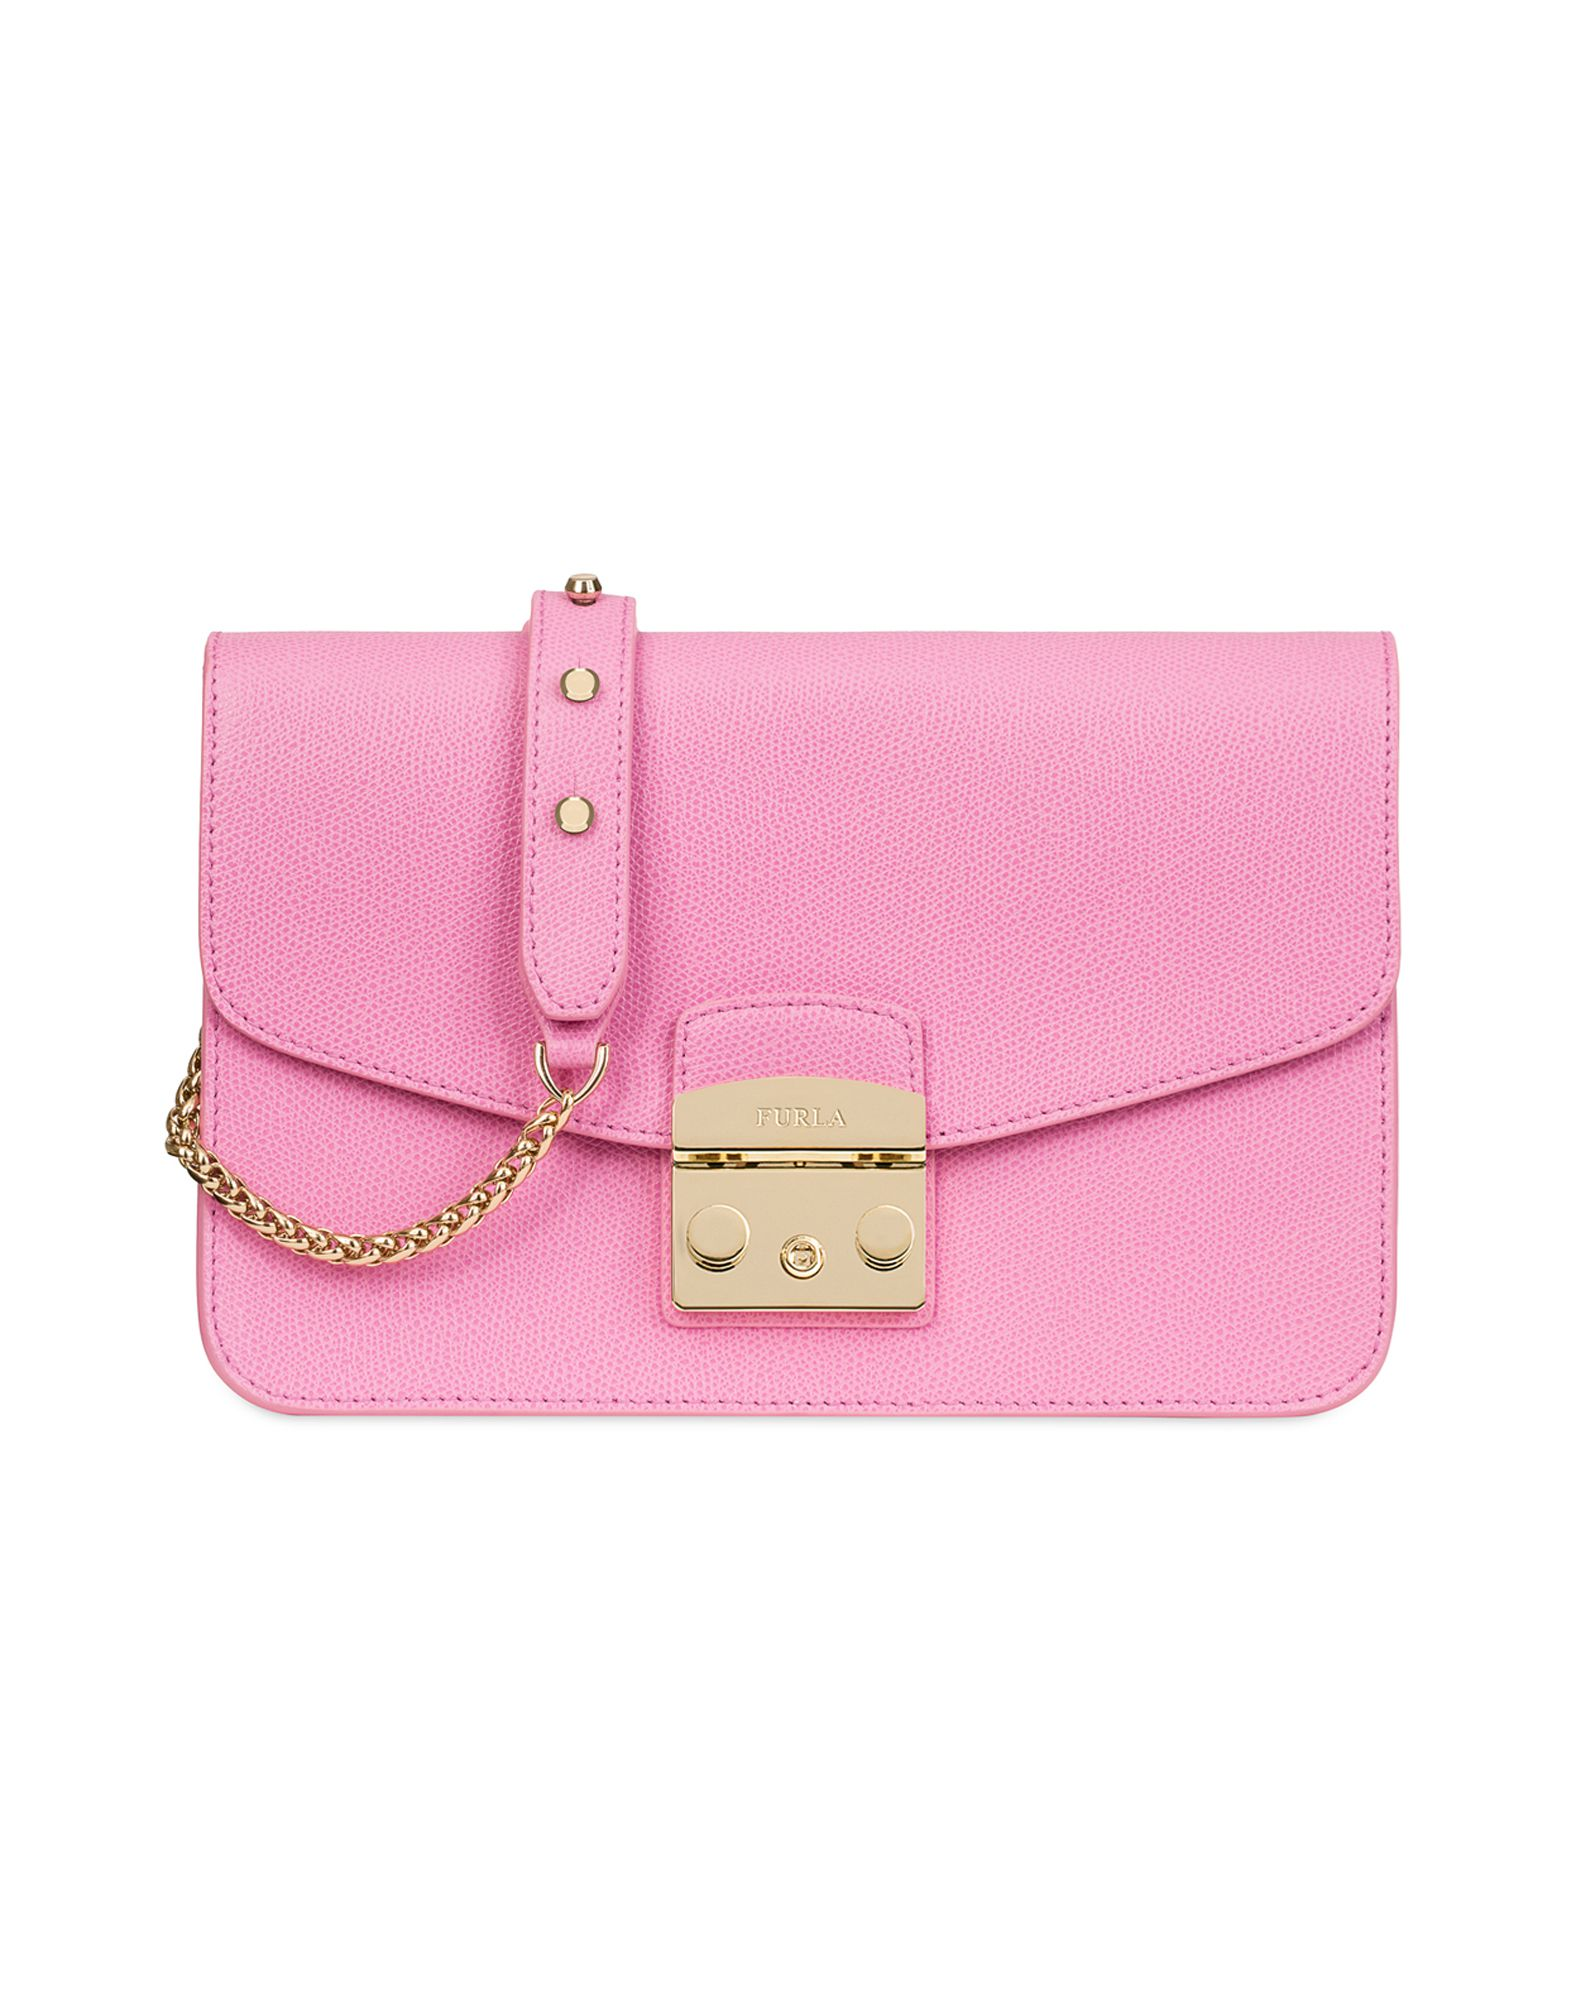 3738e143ad29 Furla Small Metropolis Saffiano Leather Bag In Fuchsia